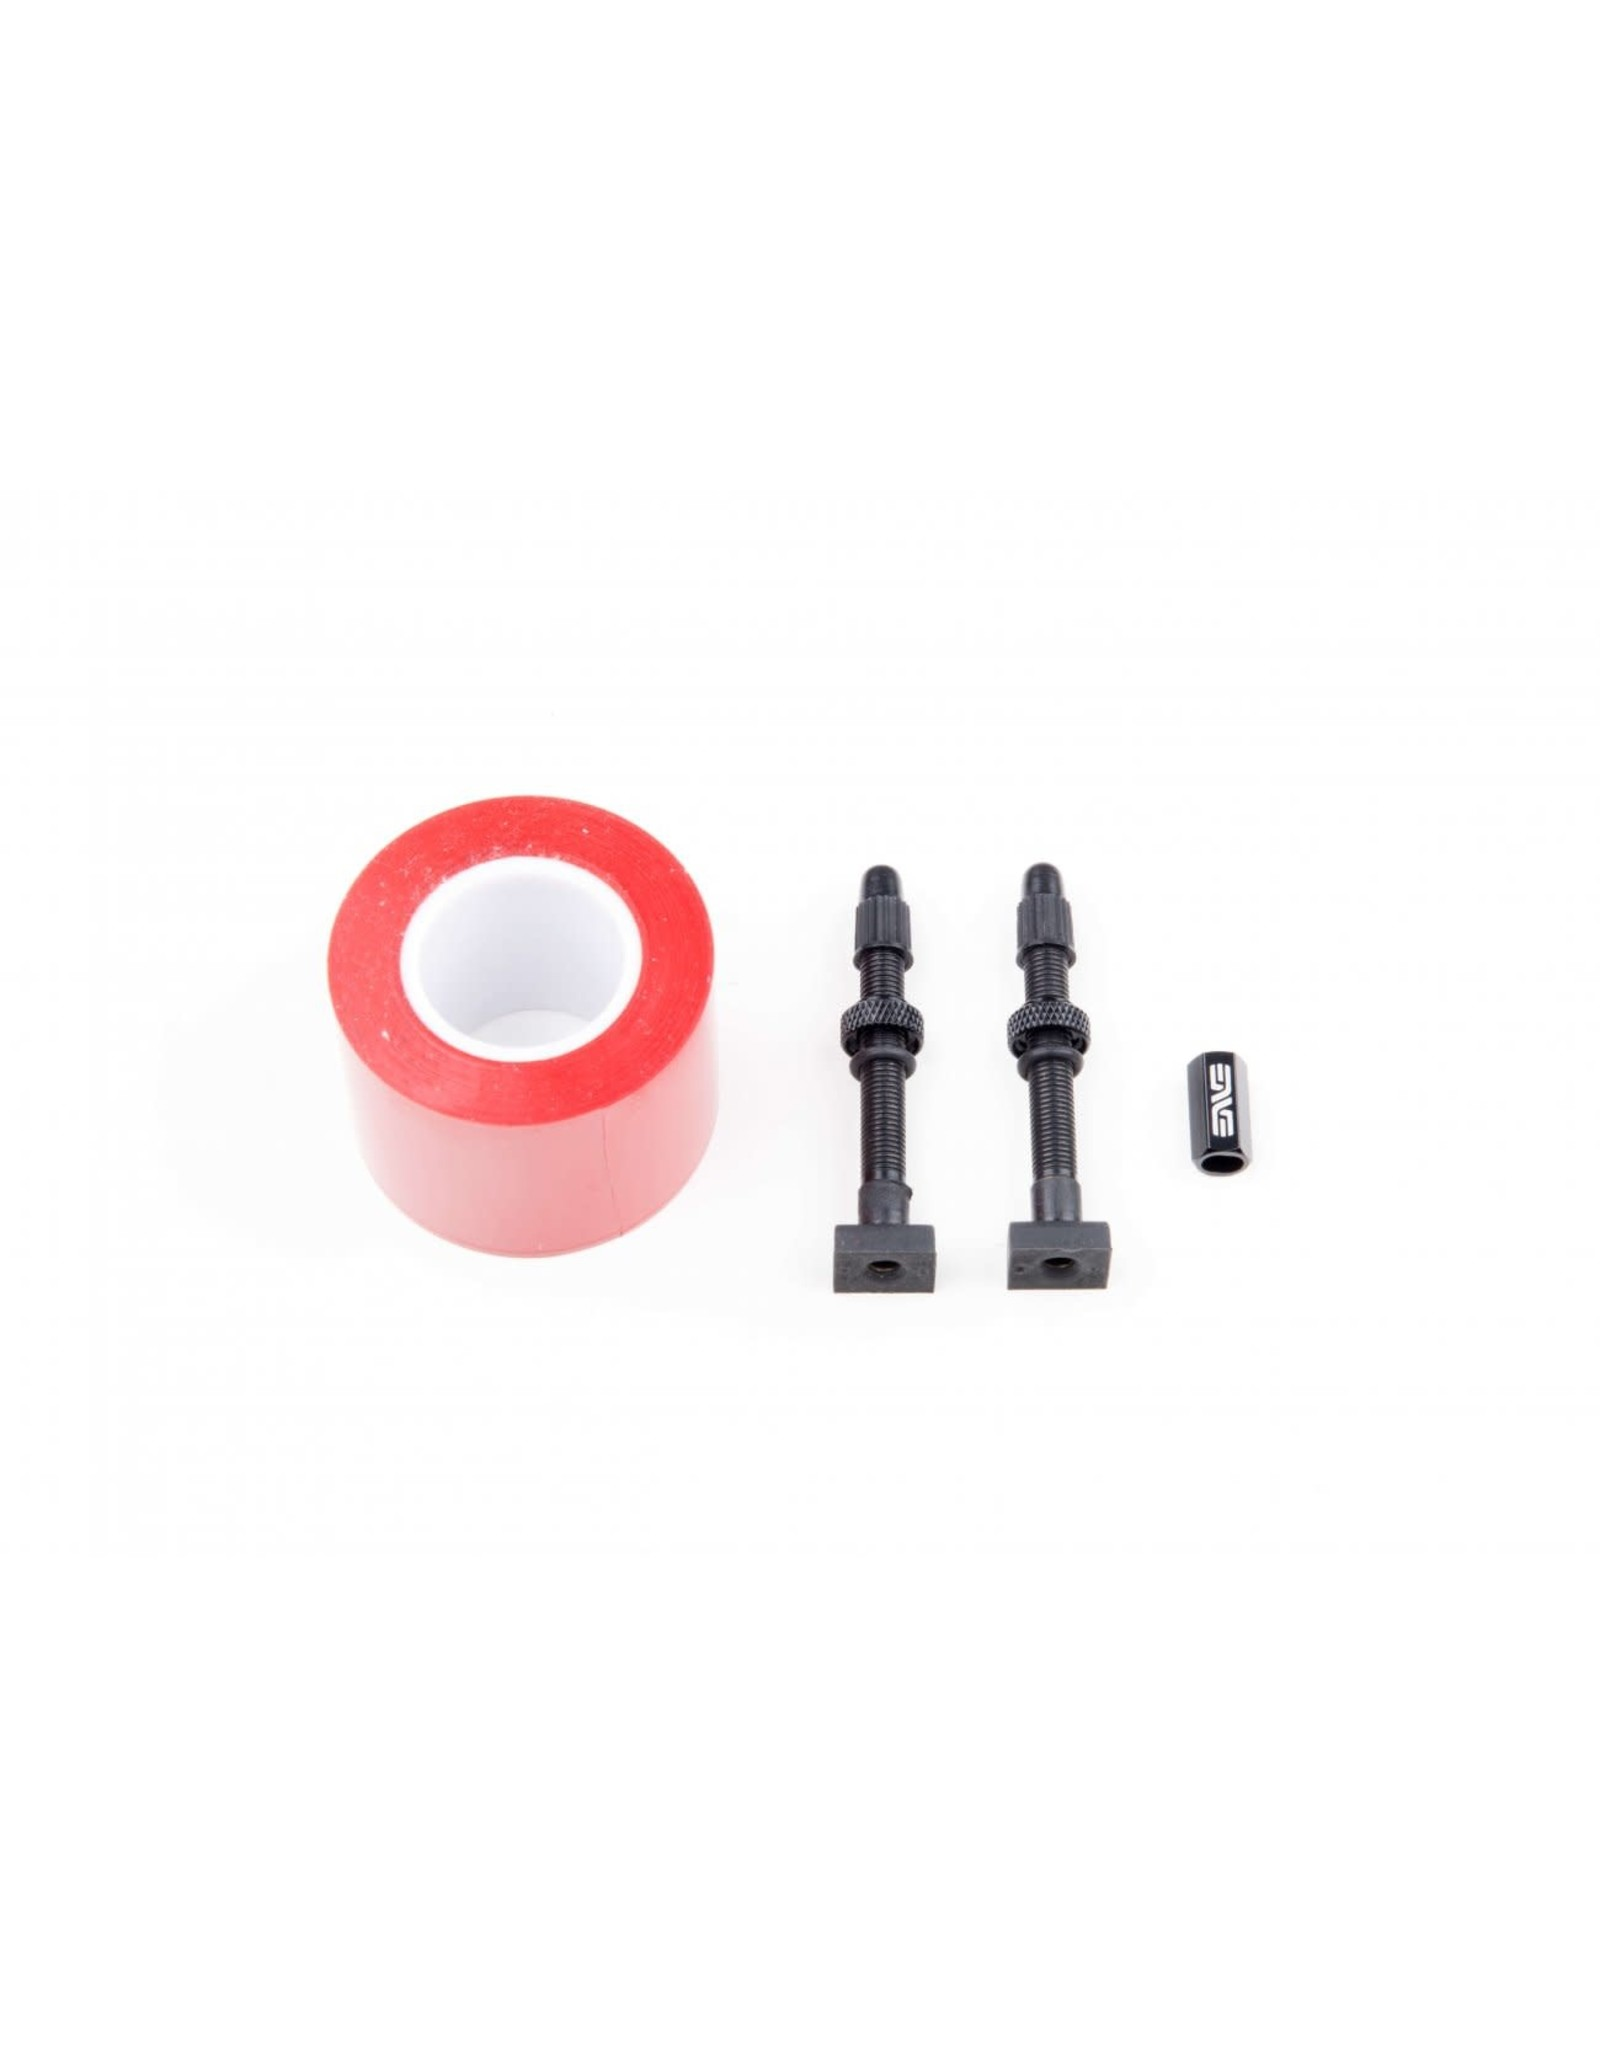 ENVE Composites ENVE AM30 Tubeless Kit (tape & valves)